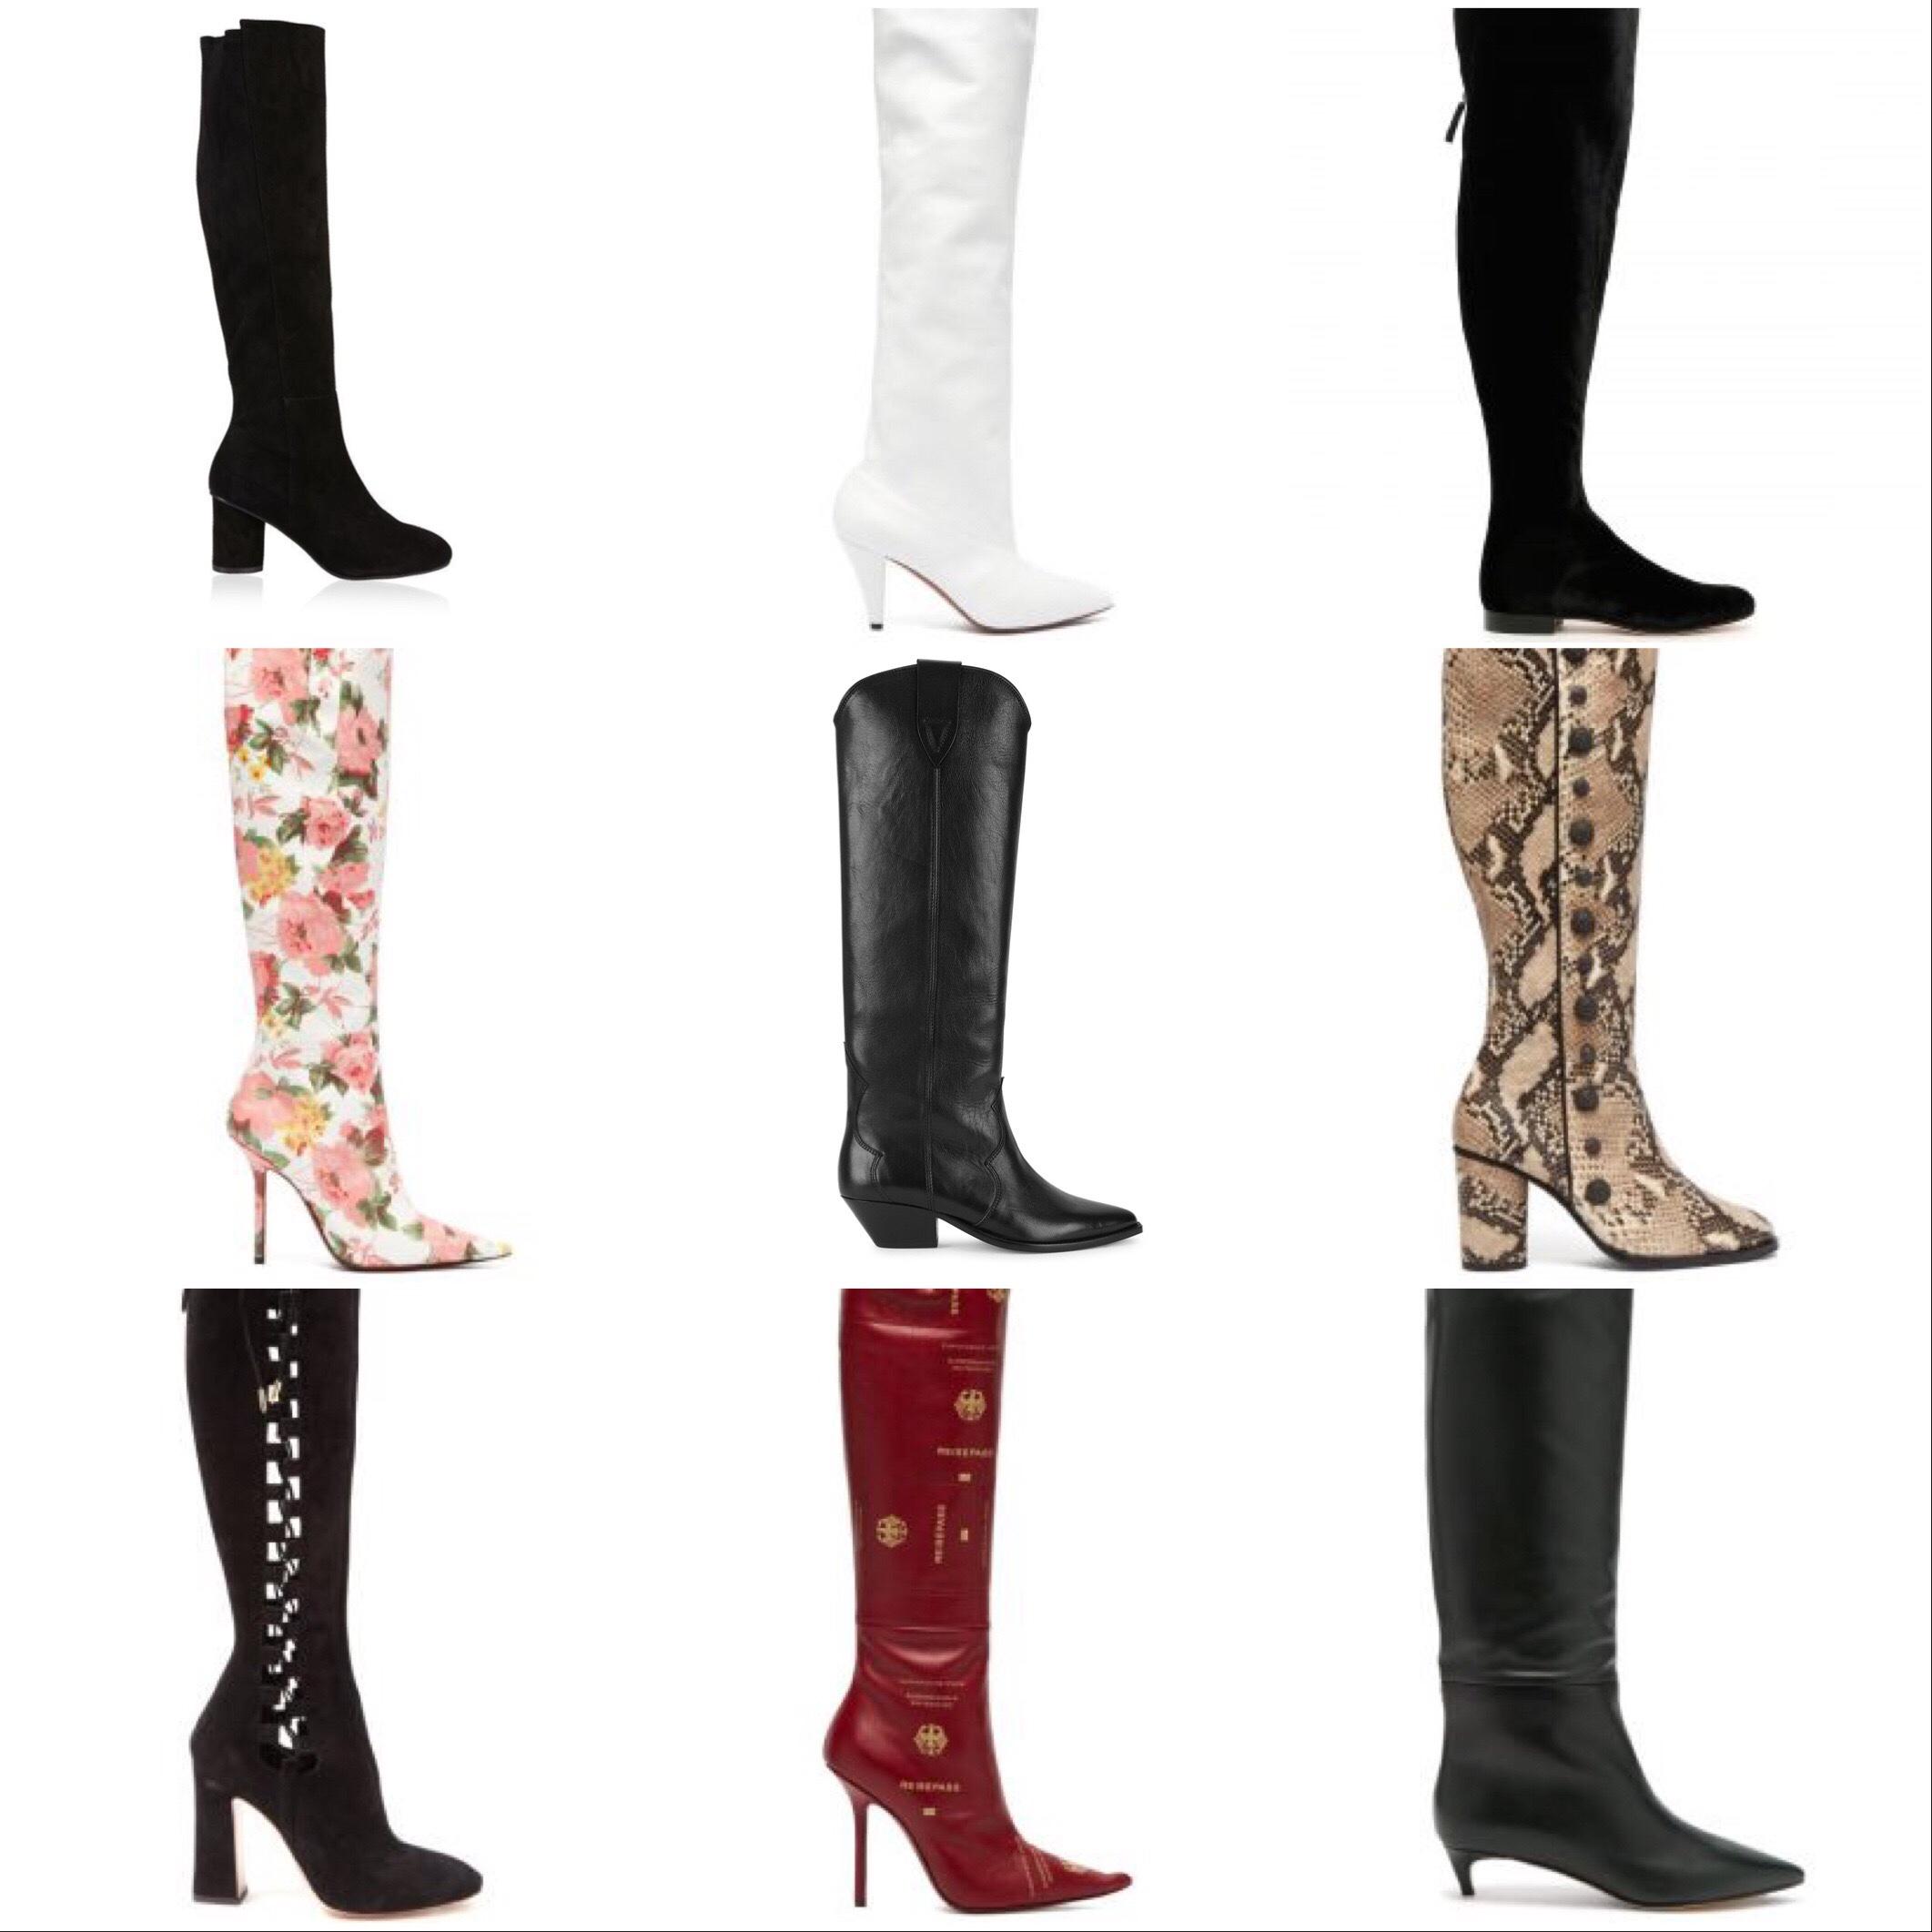 Luxury Knee-High Boot Buyers Guide